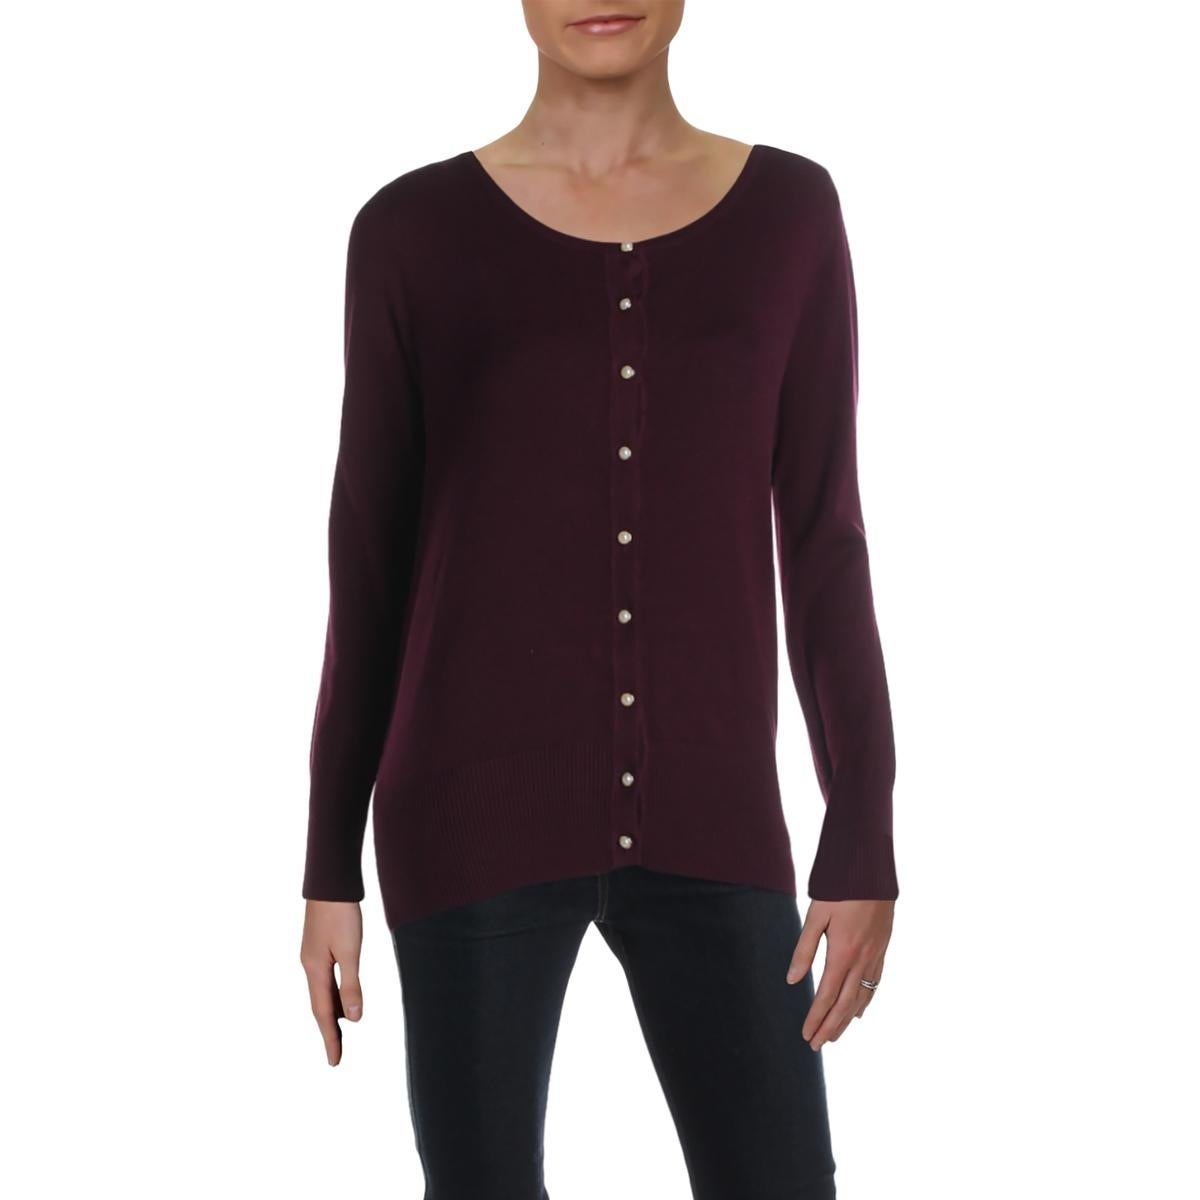 Vila Milano Womens Cardigan Sweater Embellished Long Sleeve